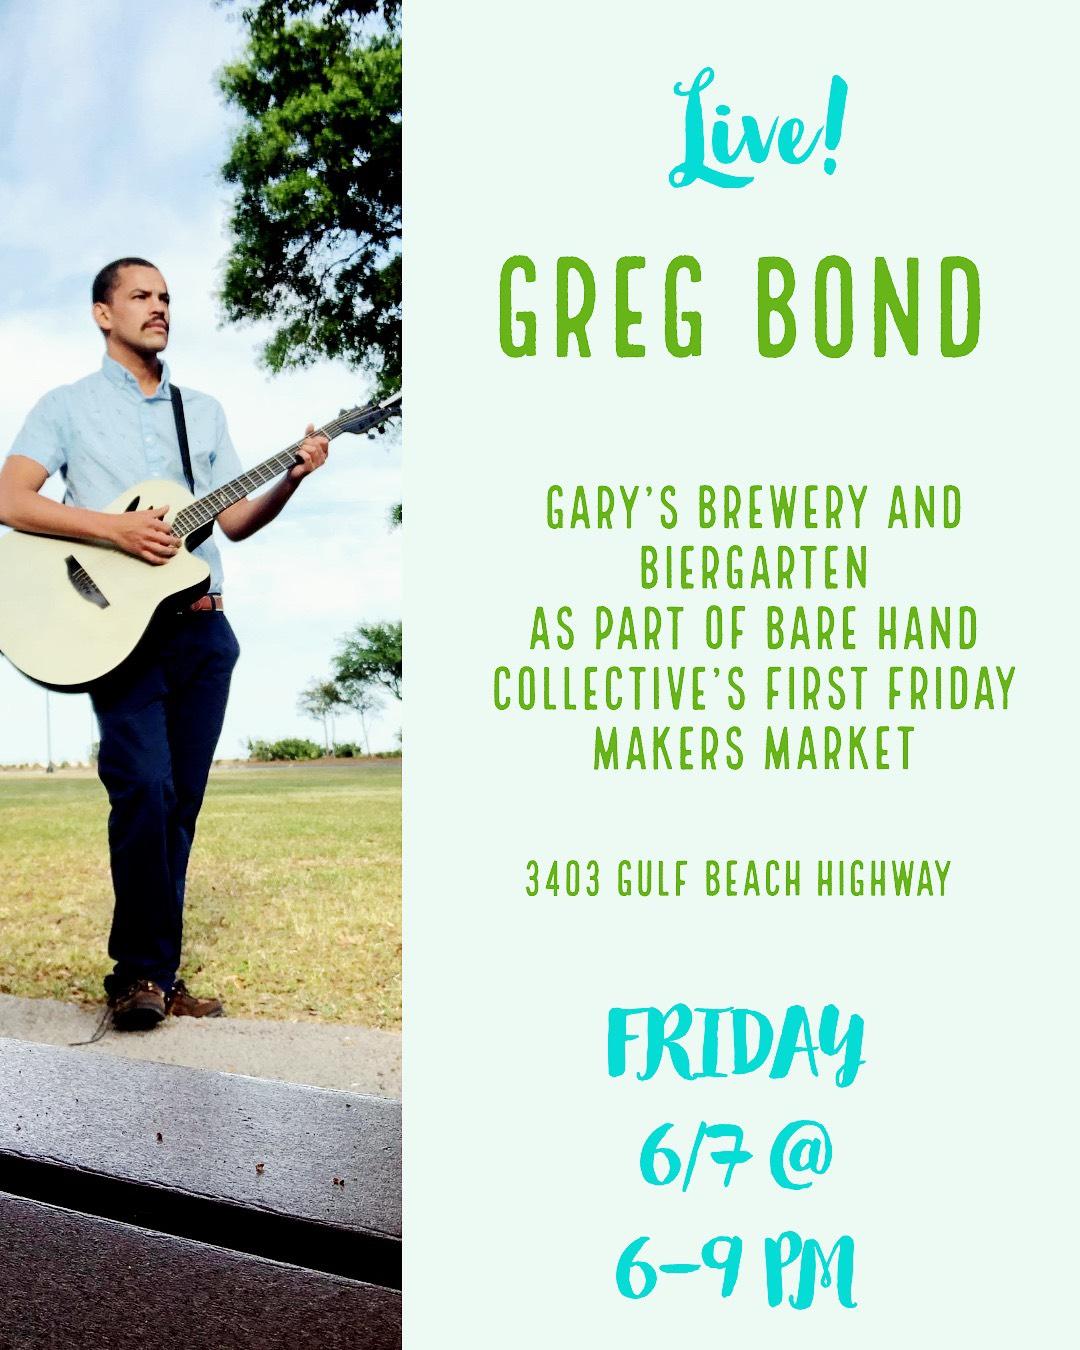 Greg Bond @ Gary's Brewery